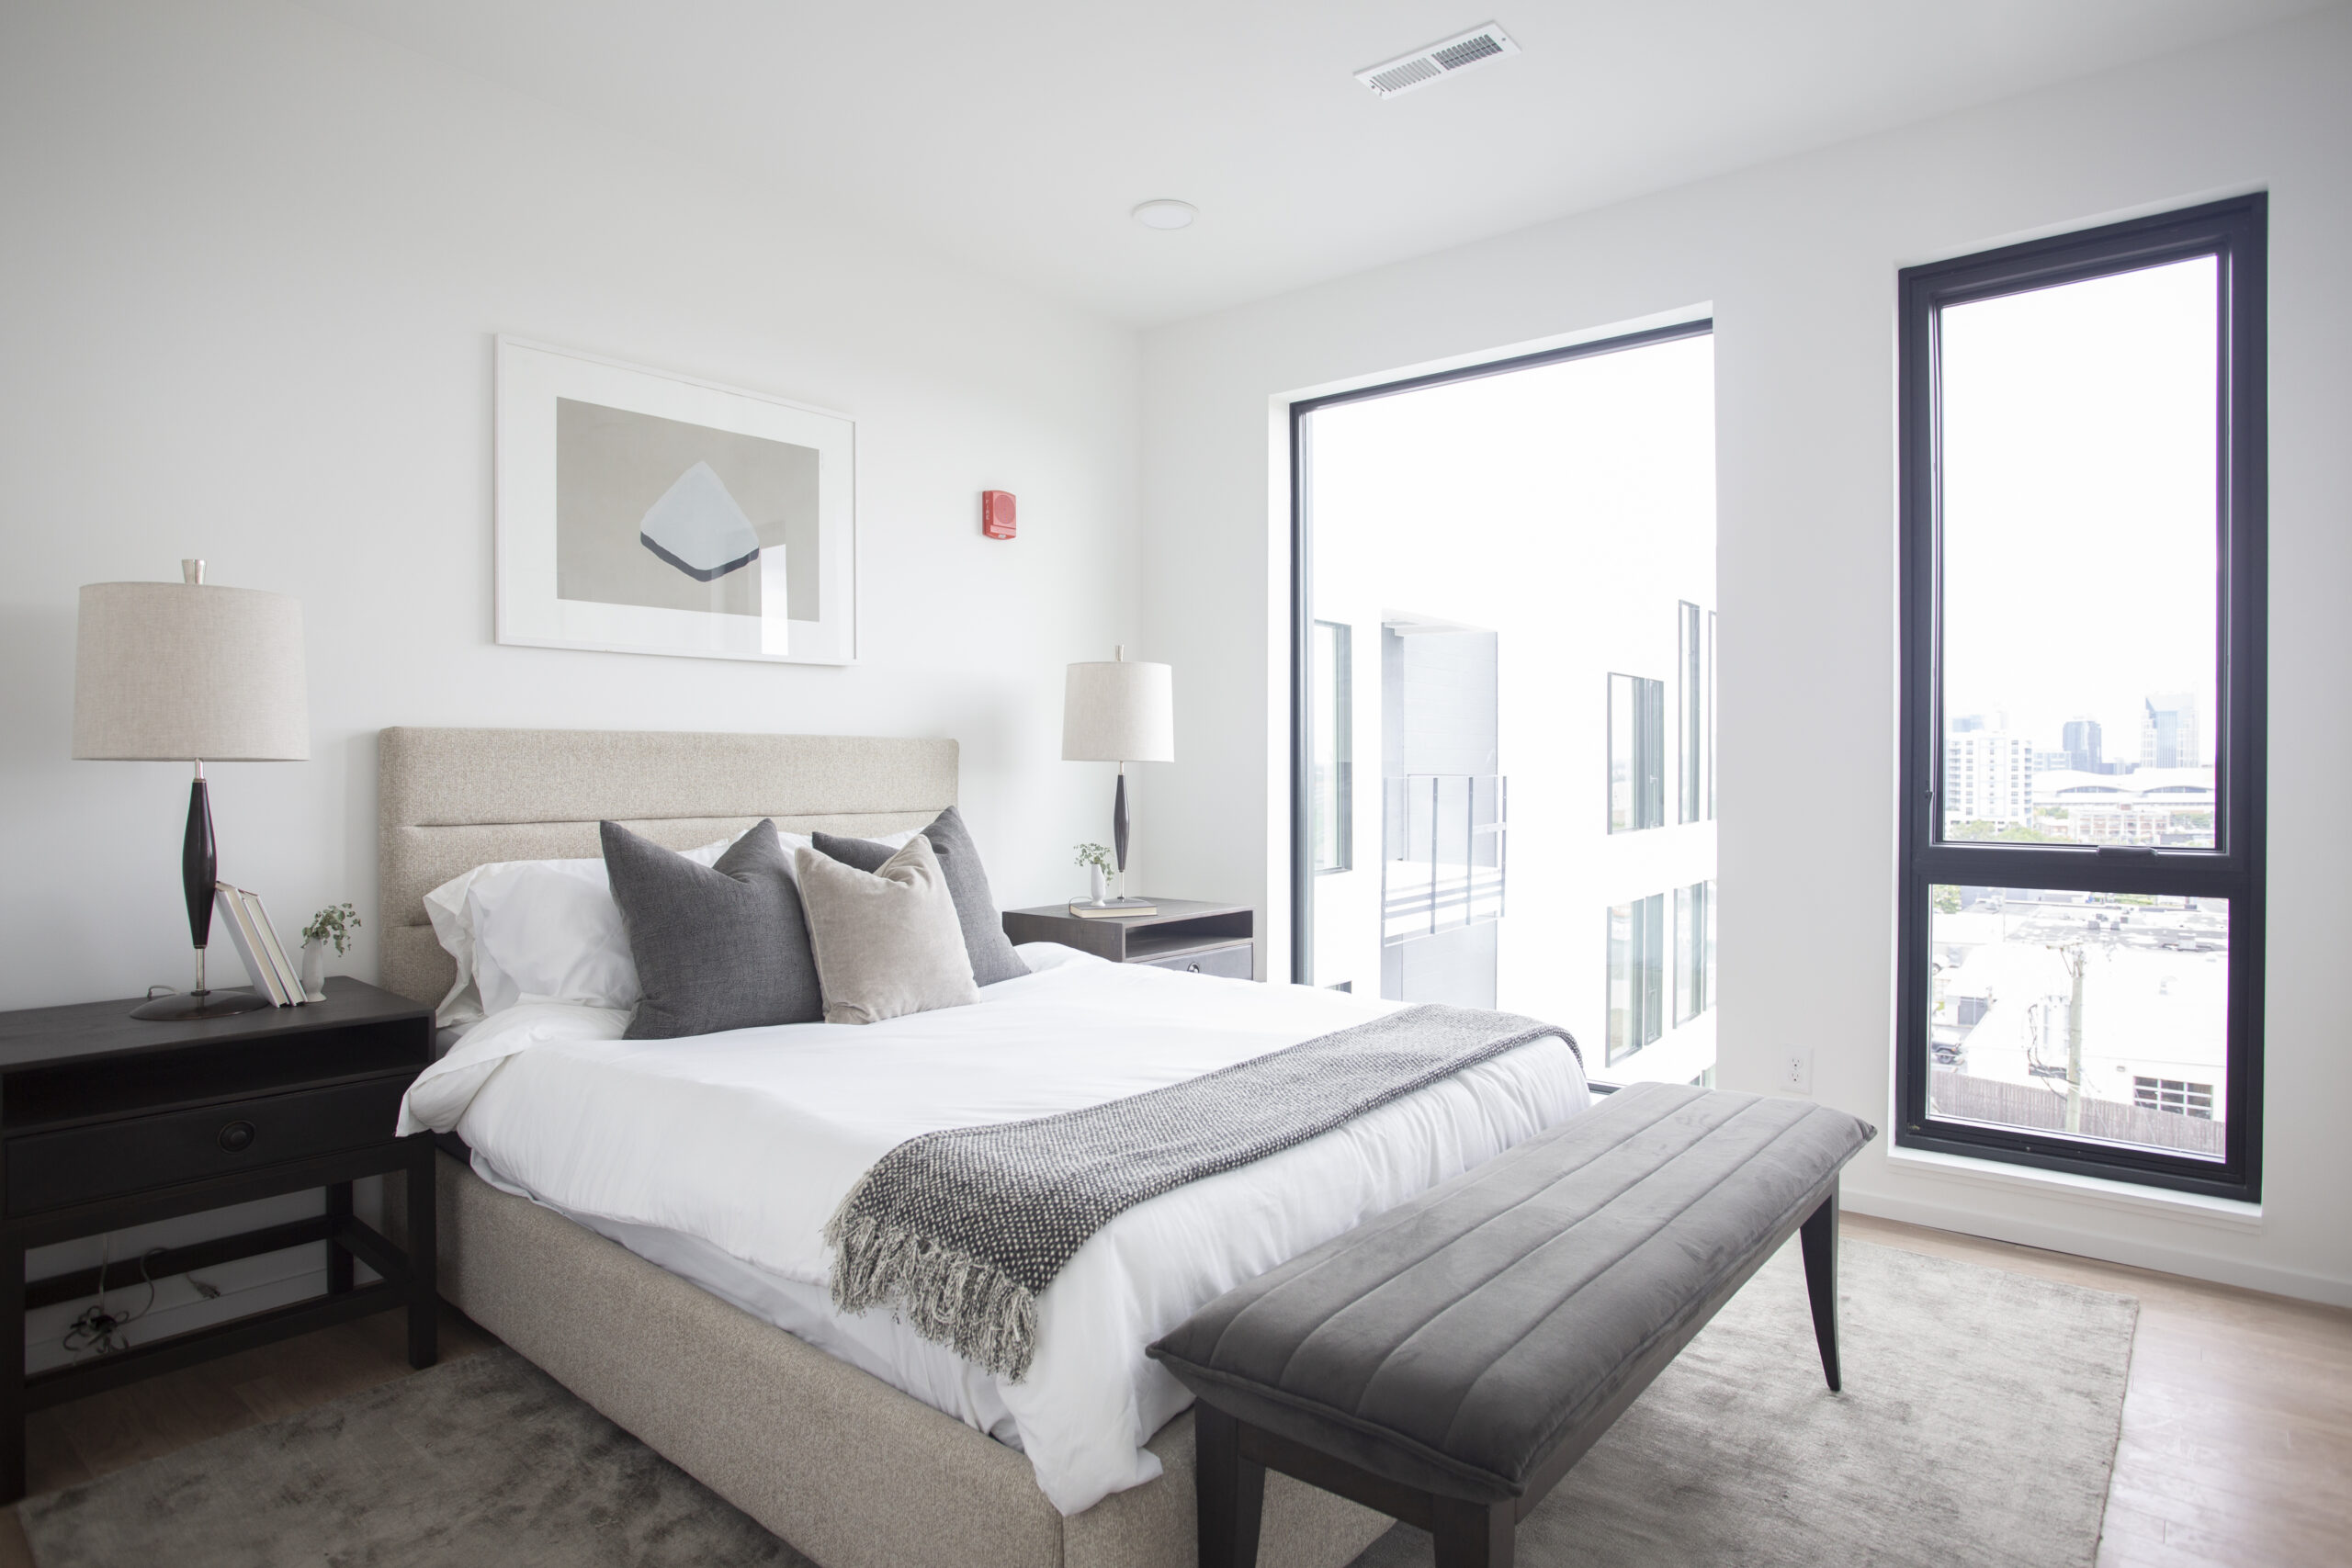 71-Mayker-Interiors-Home-Staging-Furniture-Rentals-Modern-Design-Decor-Nashville-Alina-Model-Unit